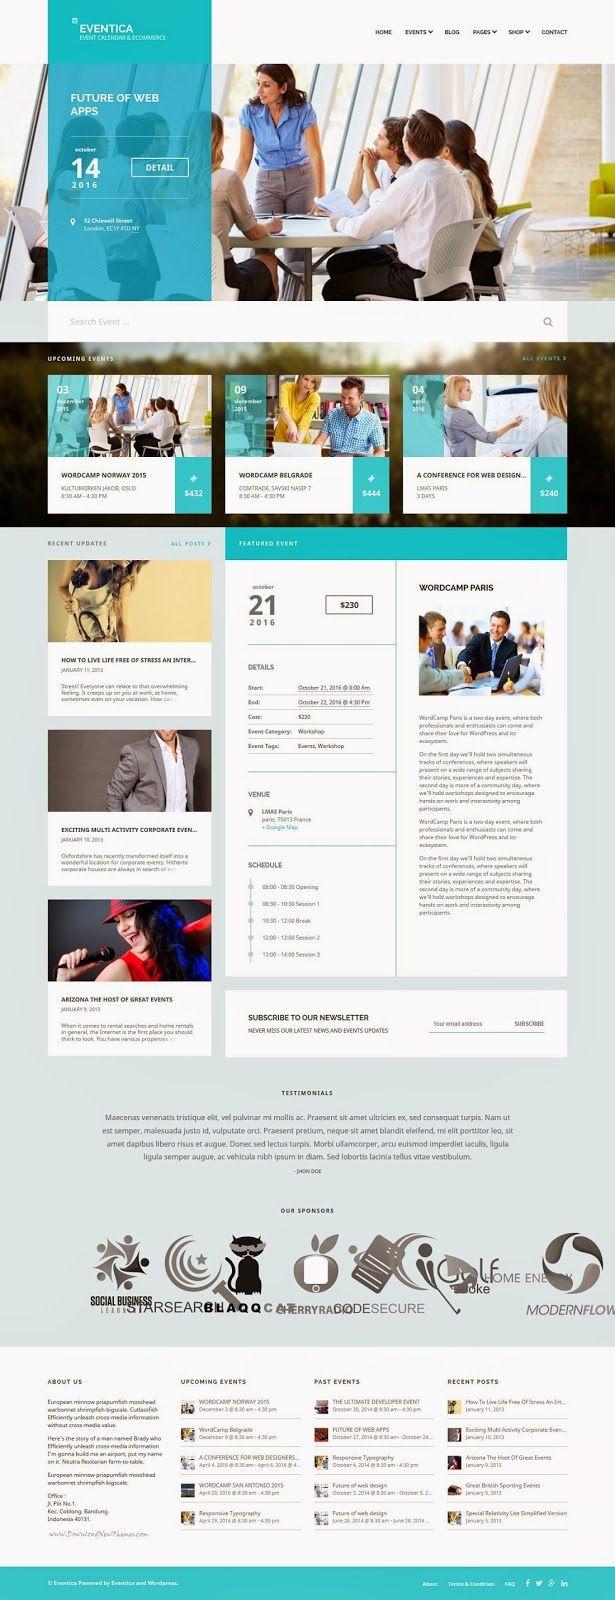 Sharepoint site design ideas - Unique Event Calendar And Ecommerce Wordpress Theme 2015 Event Websitewebsite Ideaswebsite Designsevent